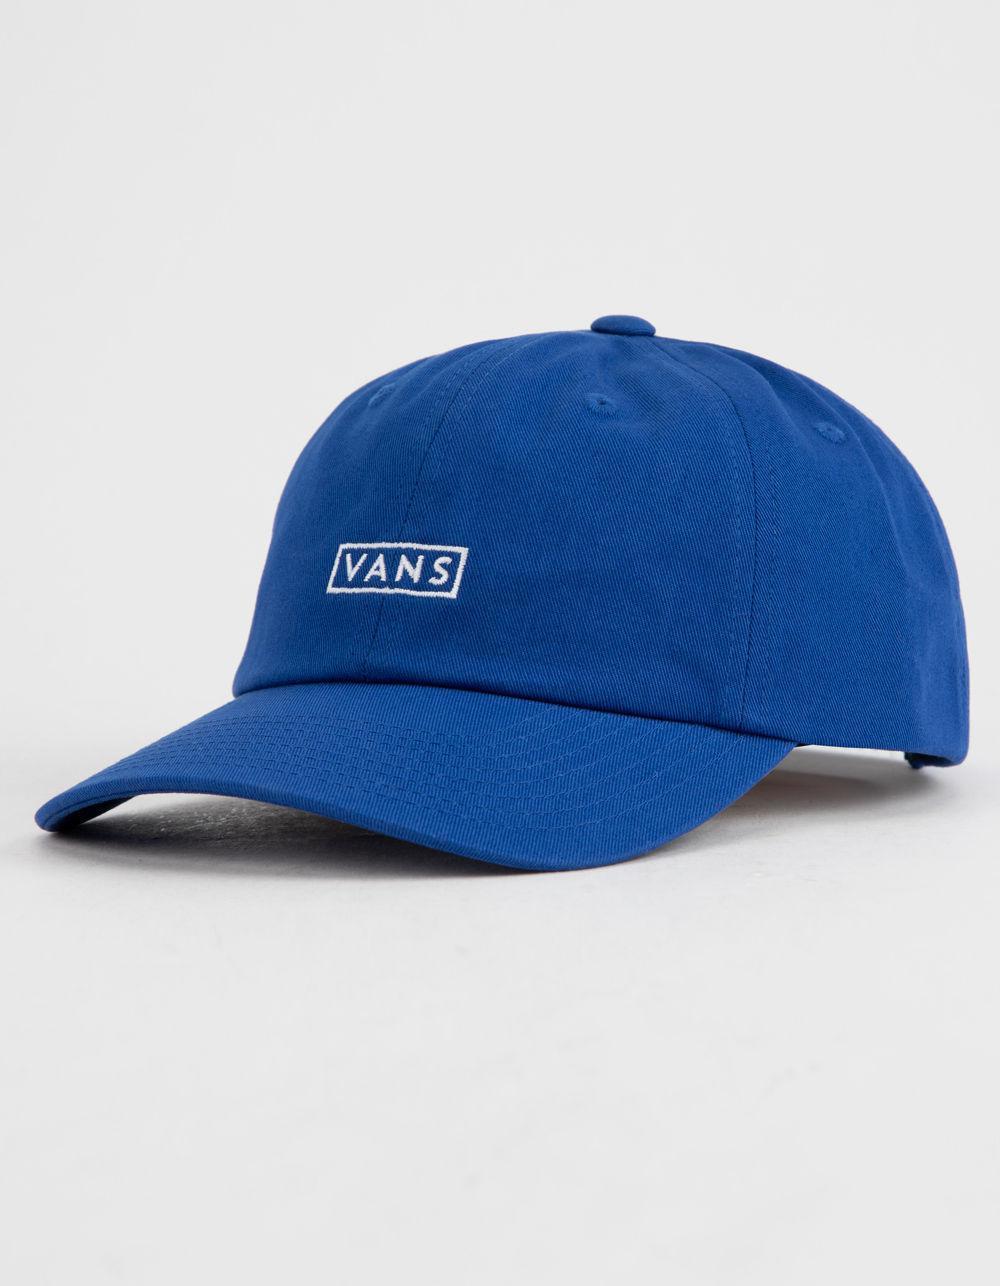 1176ea57fca7f7 Vans - Blue Curved Bill Jockey Ever Mens Strapback Hat for Men - Lyst. View  fullscreen